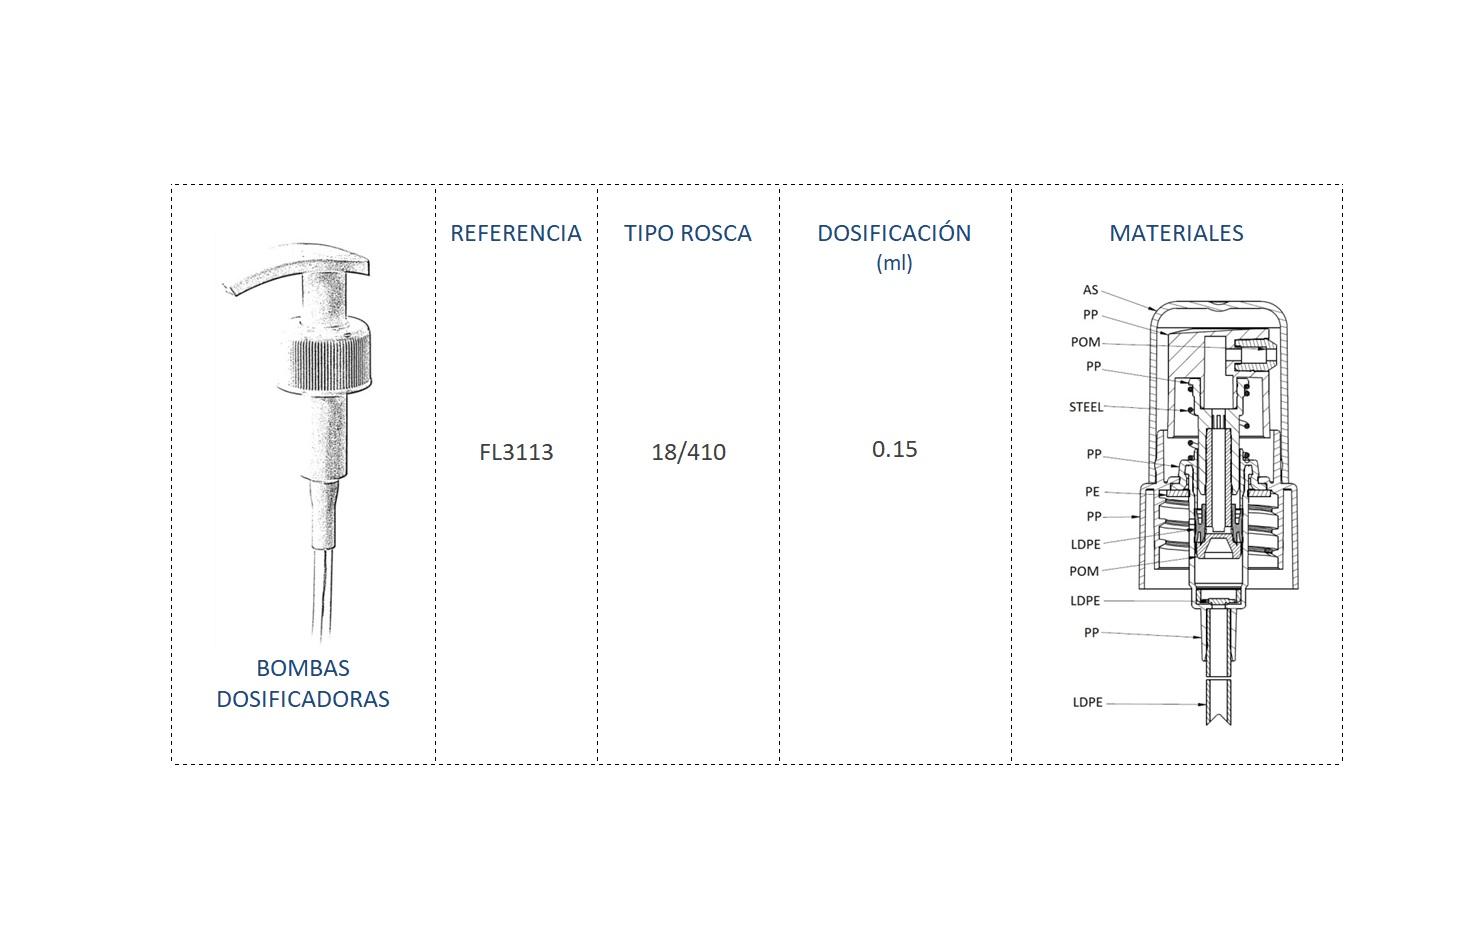 Cuadro de materiales bomba dosificadora FL3113 18/410